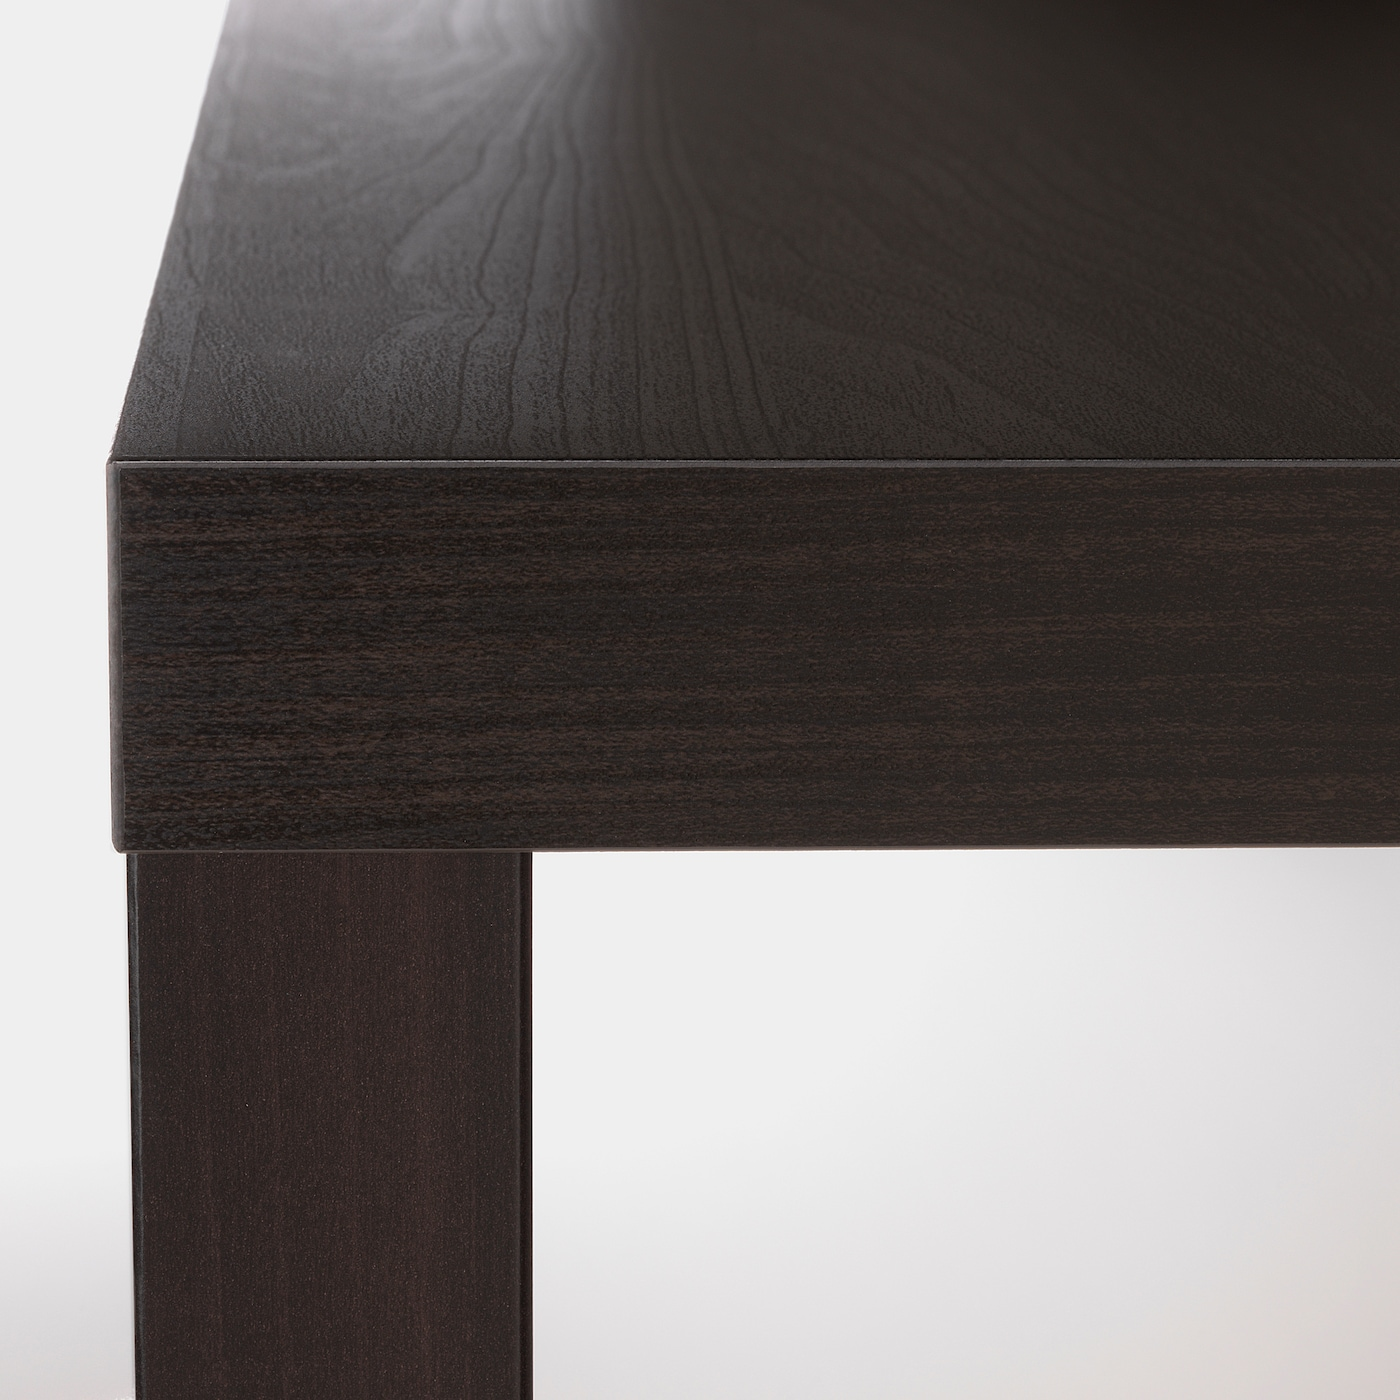 Lack Side Table Black Brown 55x55 Cm Ikea [ 1400 x 1400 Pixel ]